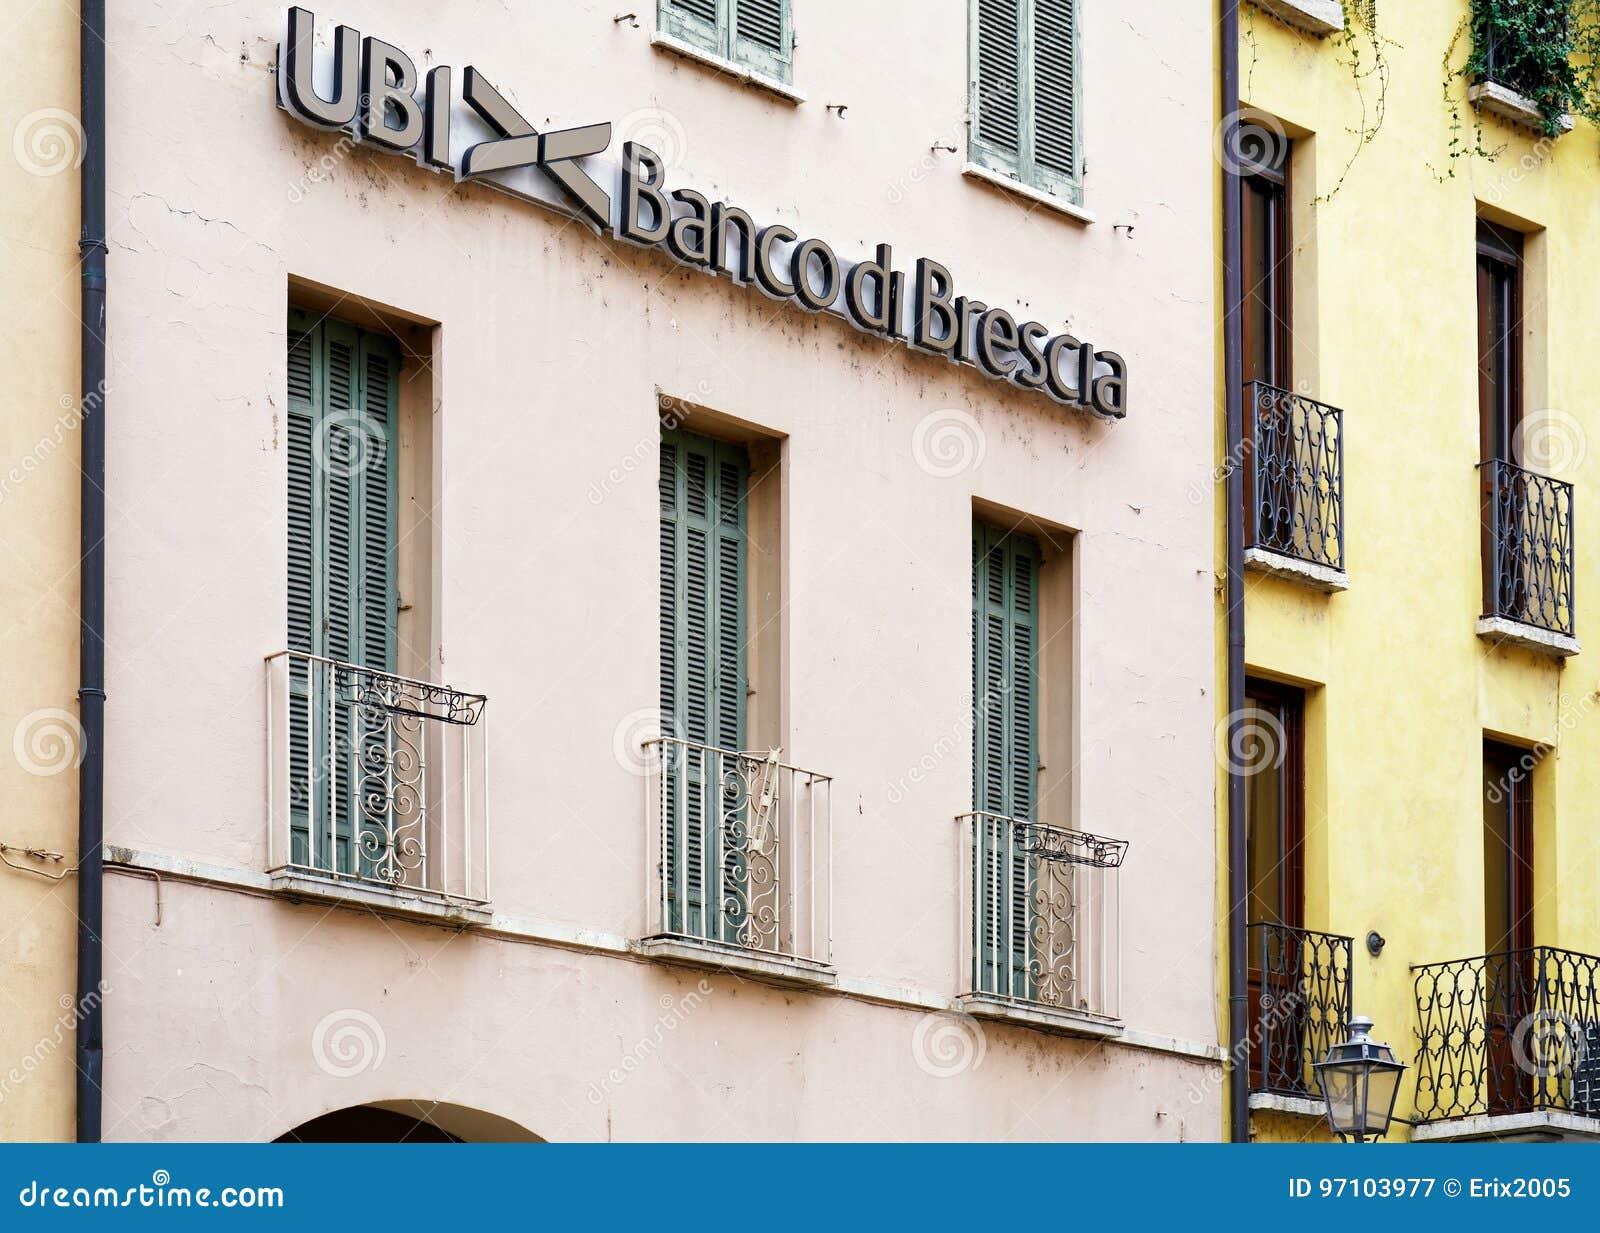 UBI Banca di Brescia entrance in Mantua